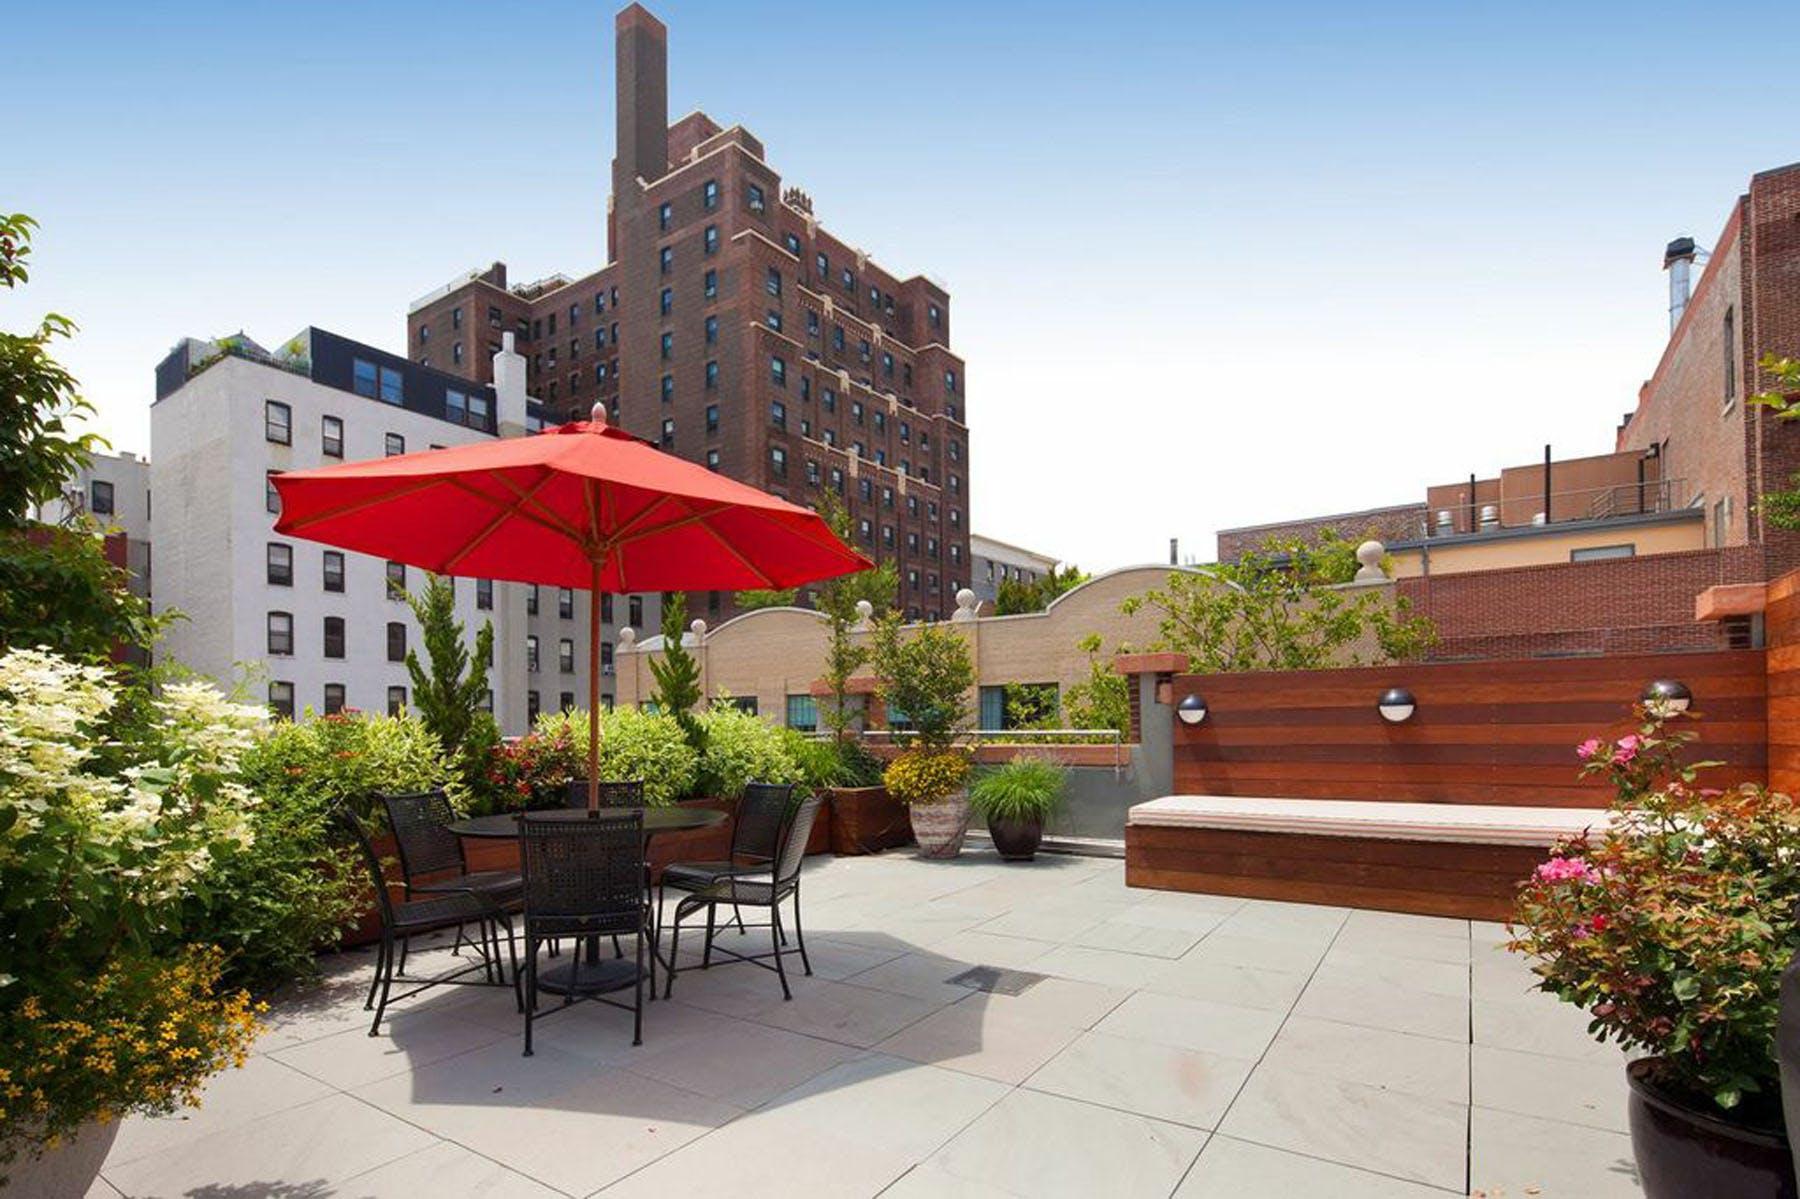 Brooklyn, NYC Backyard Patio and Rooftop Terrace Garden ...